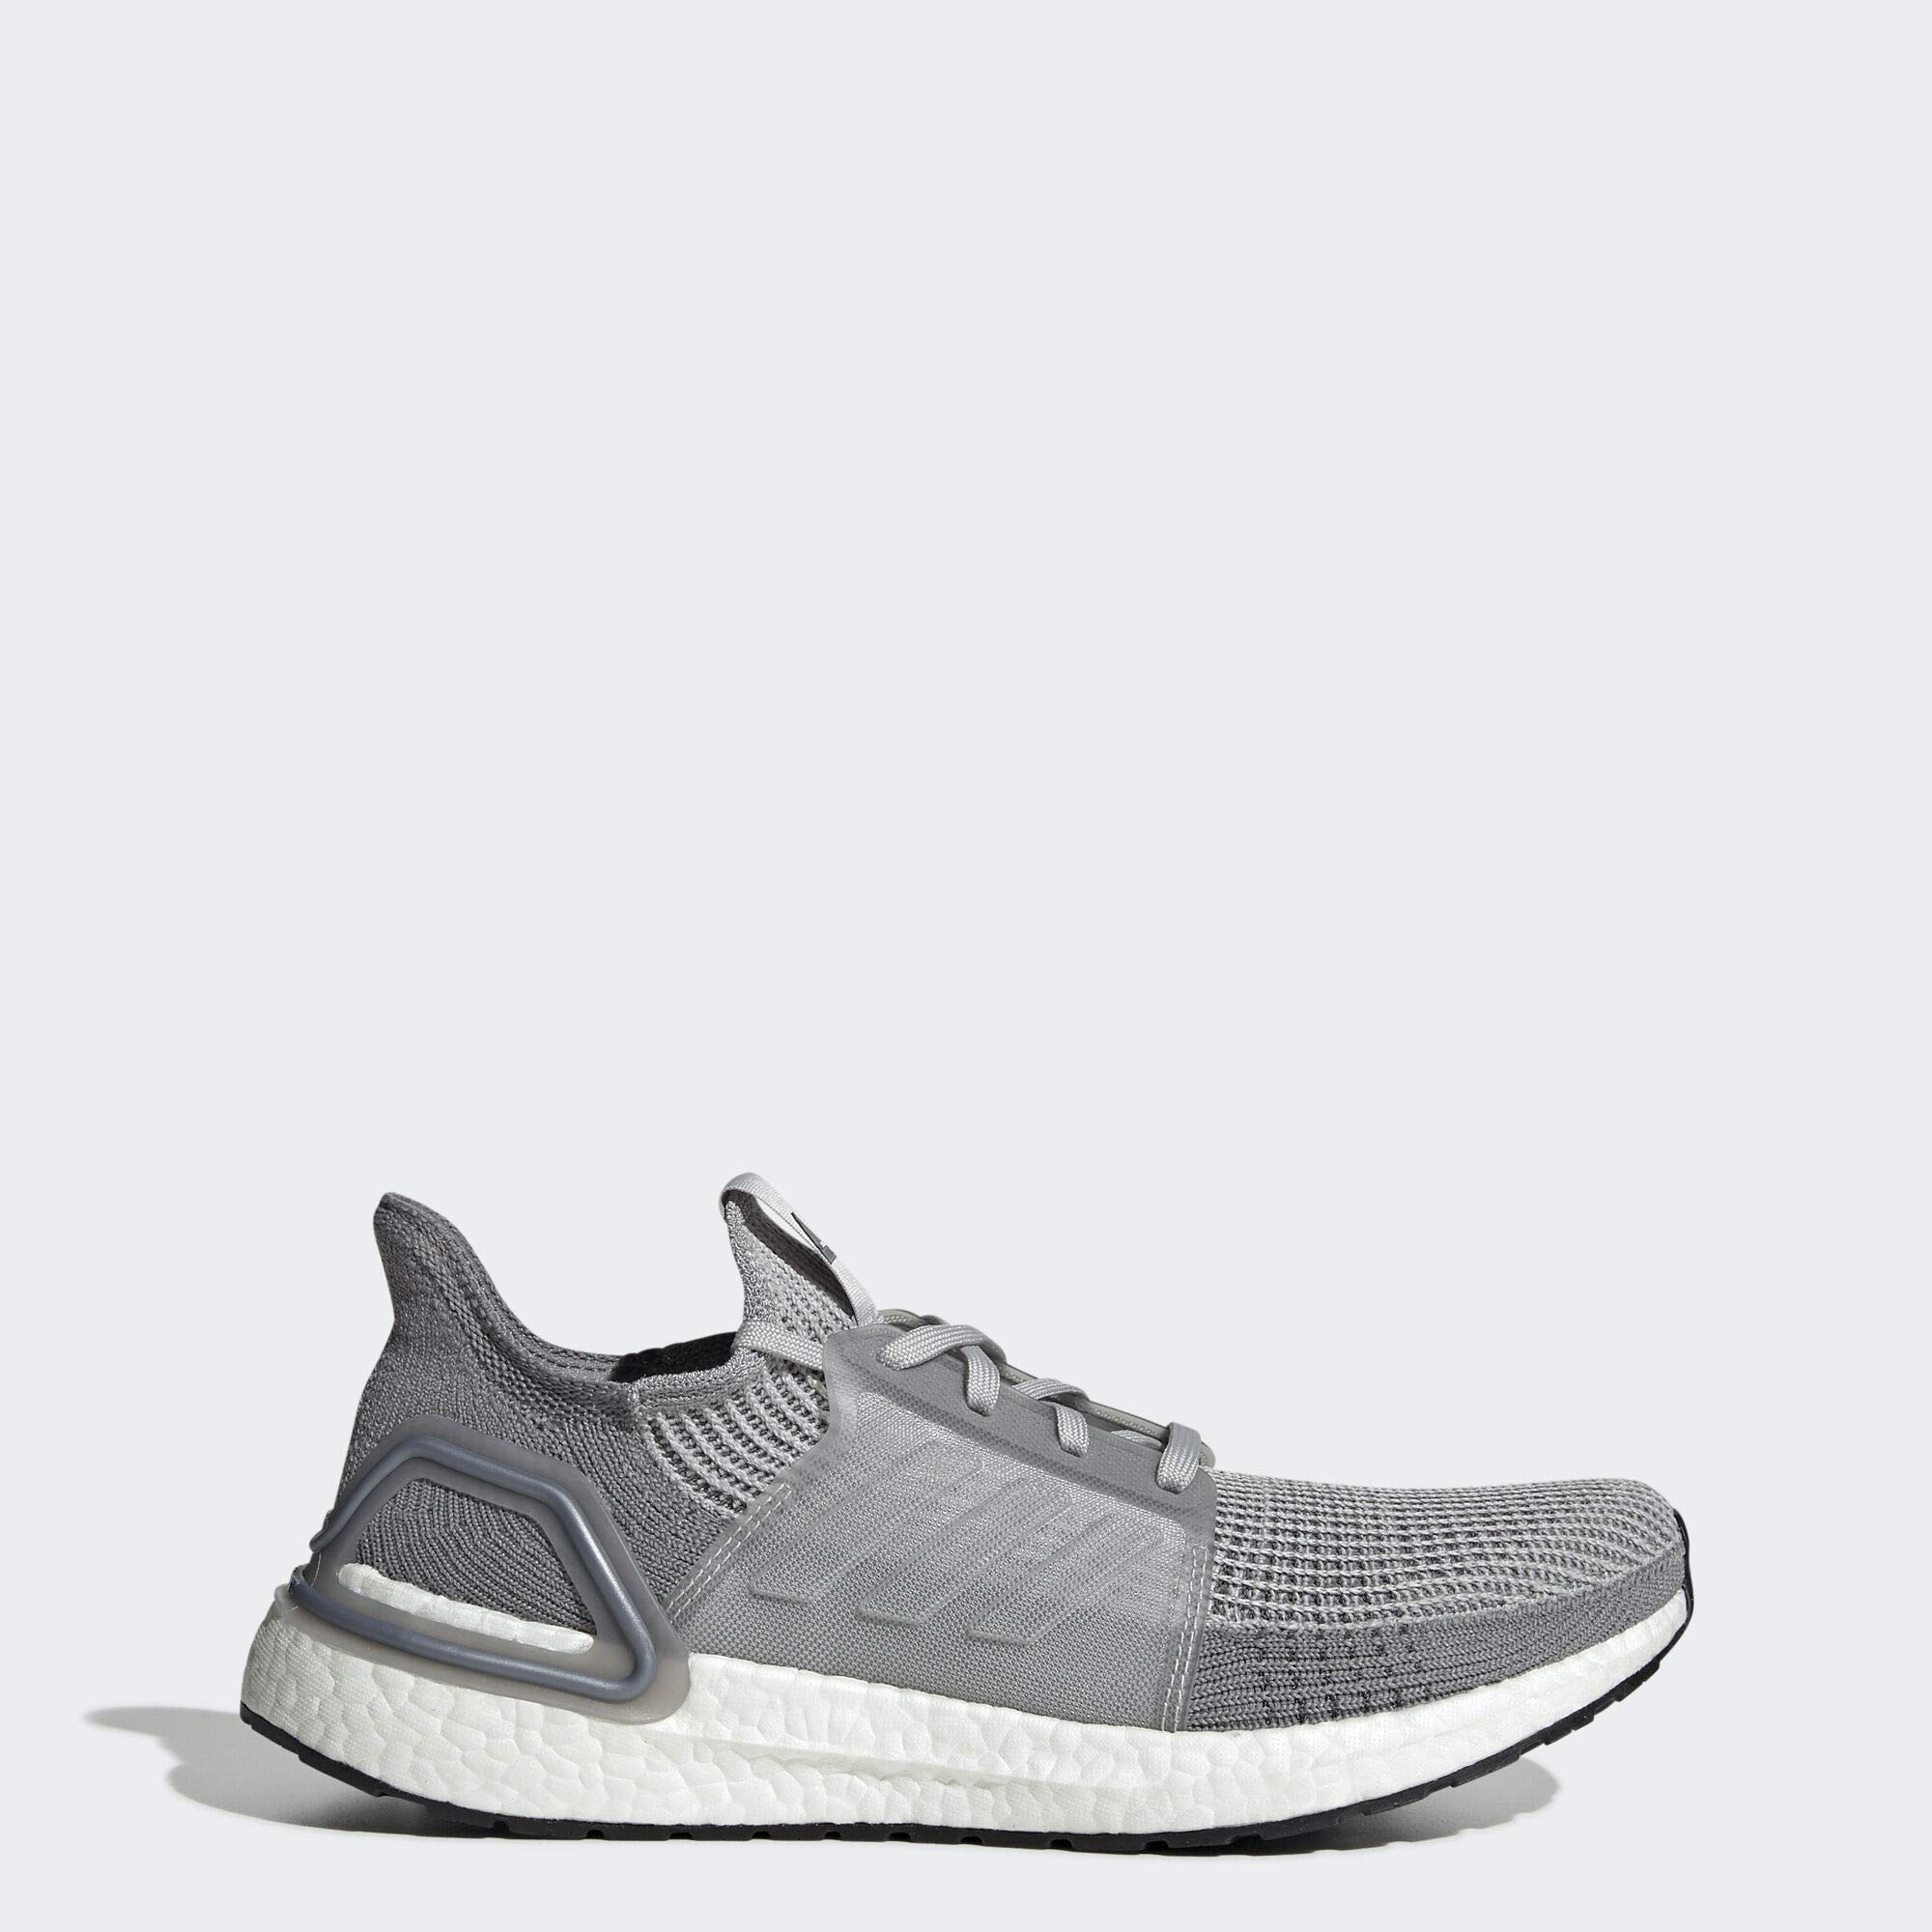 adidas Men's Ultraboost 19 m Running Shoe, Two/Grey Six, 11 Standard US Width US by adidas